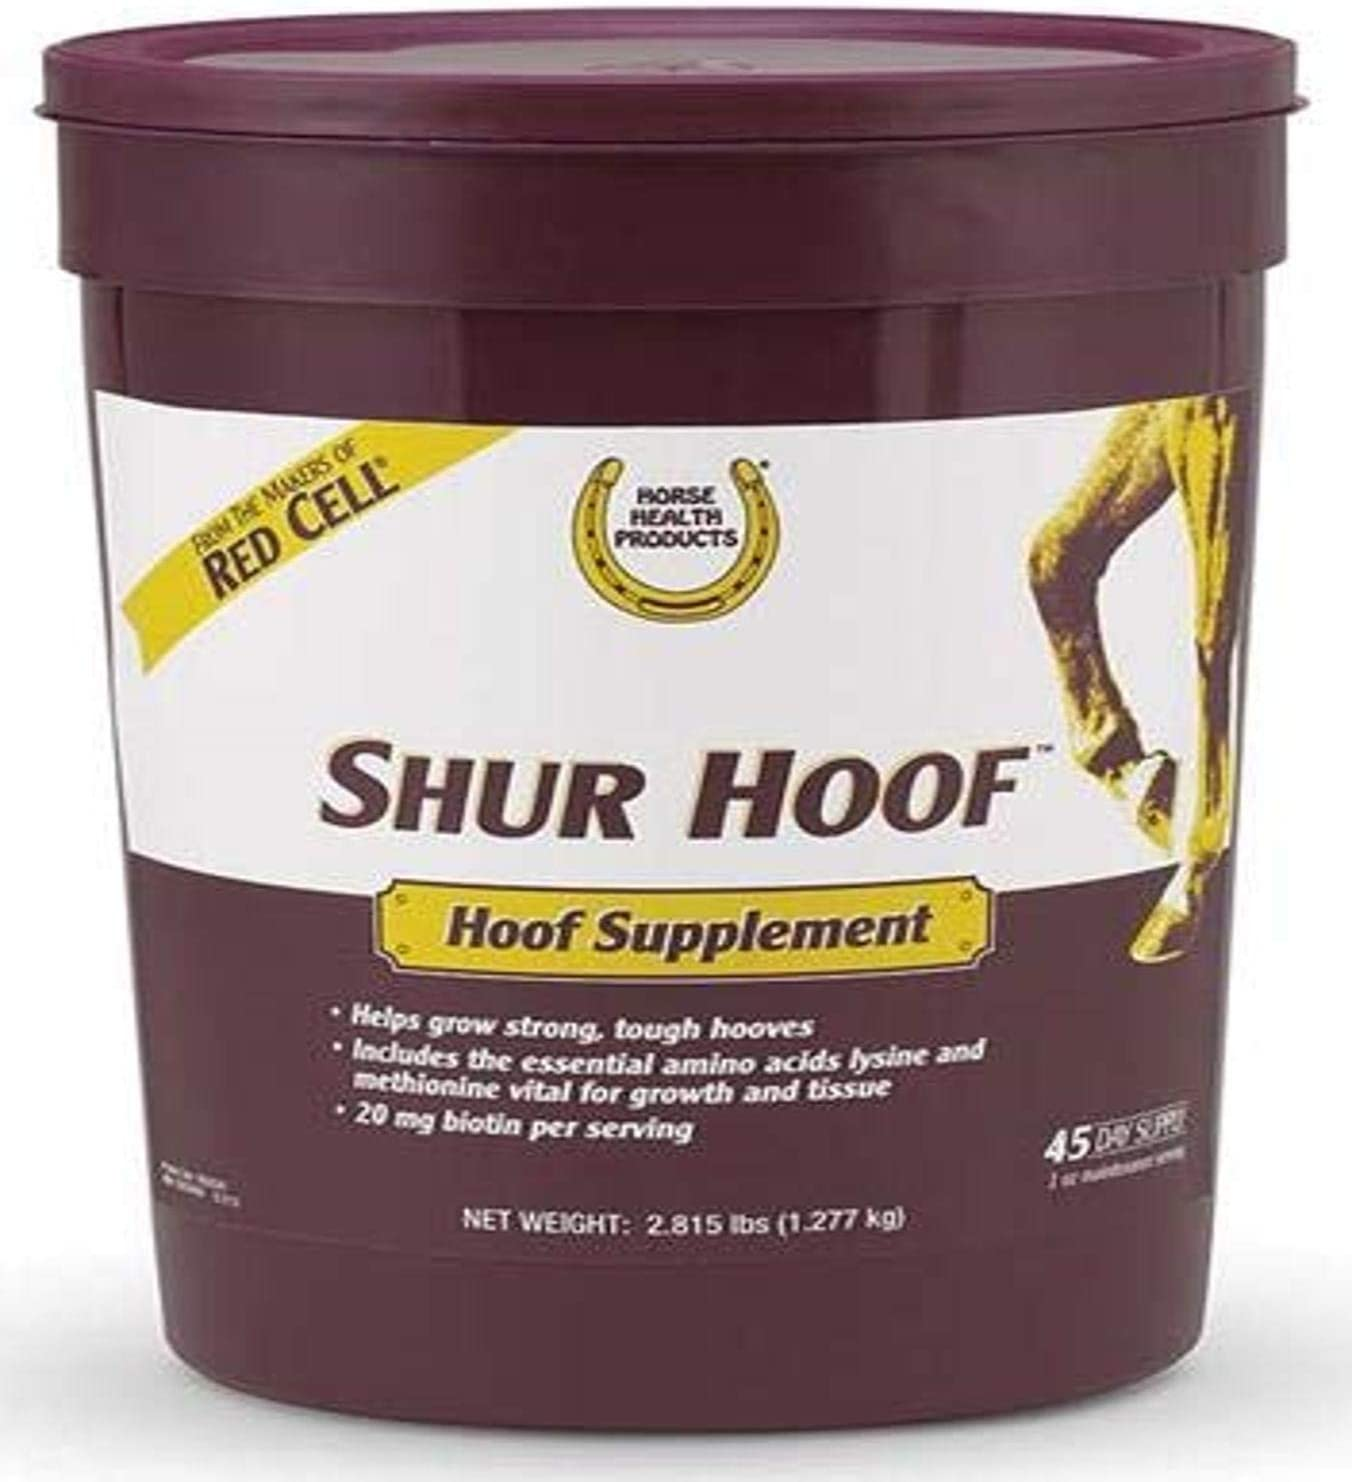 Horse Health Shur Hoof Hoof Supplement, 2.815 lbs